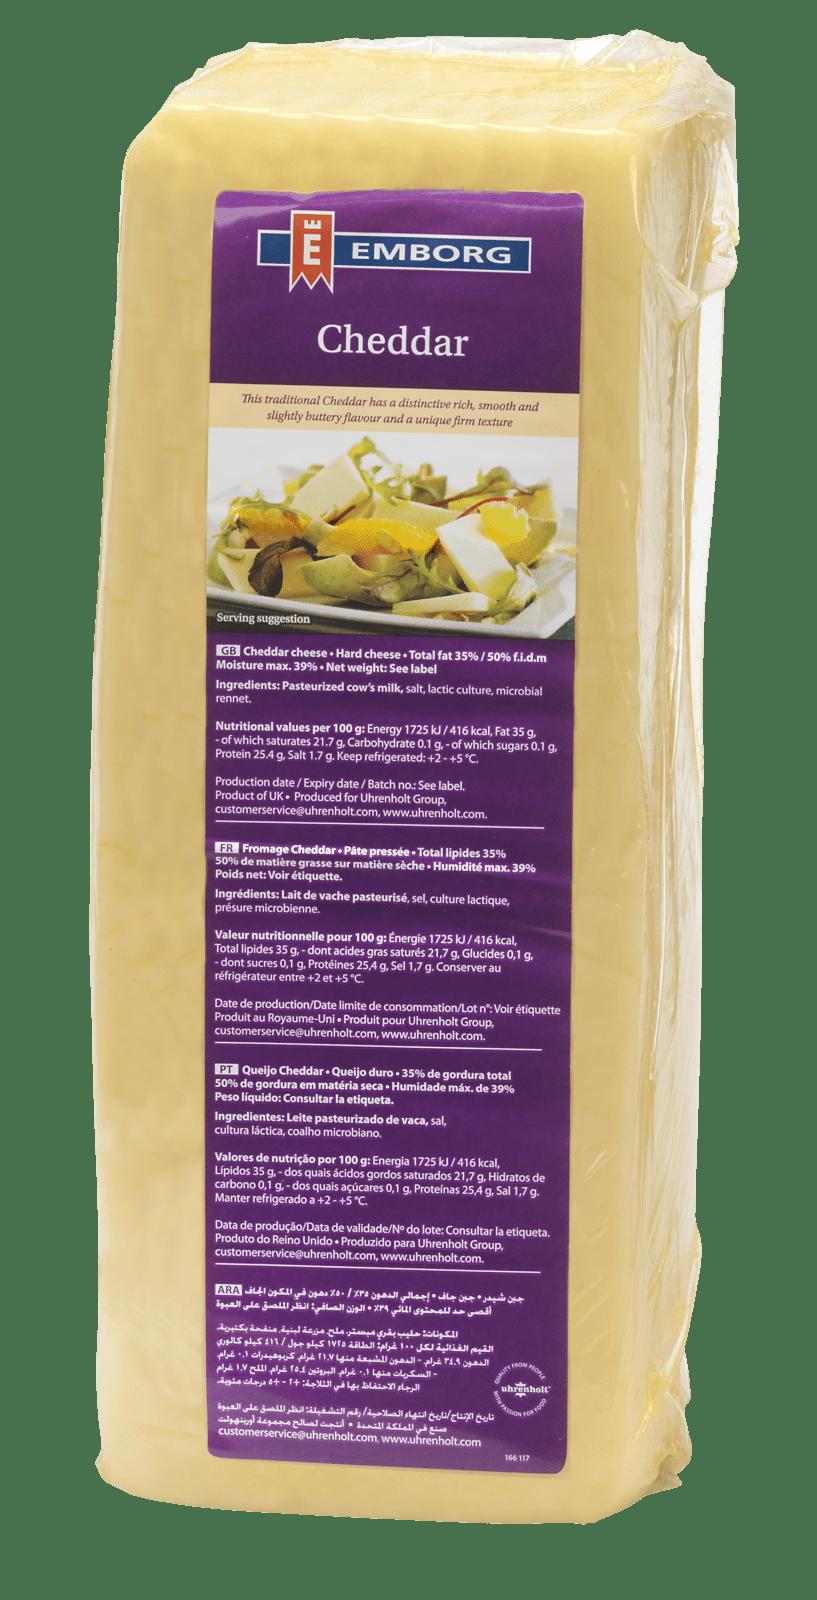 White cheddar 2.5 uhrenholt